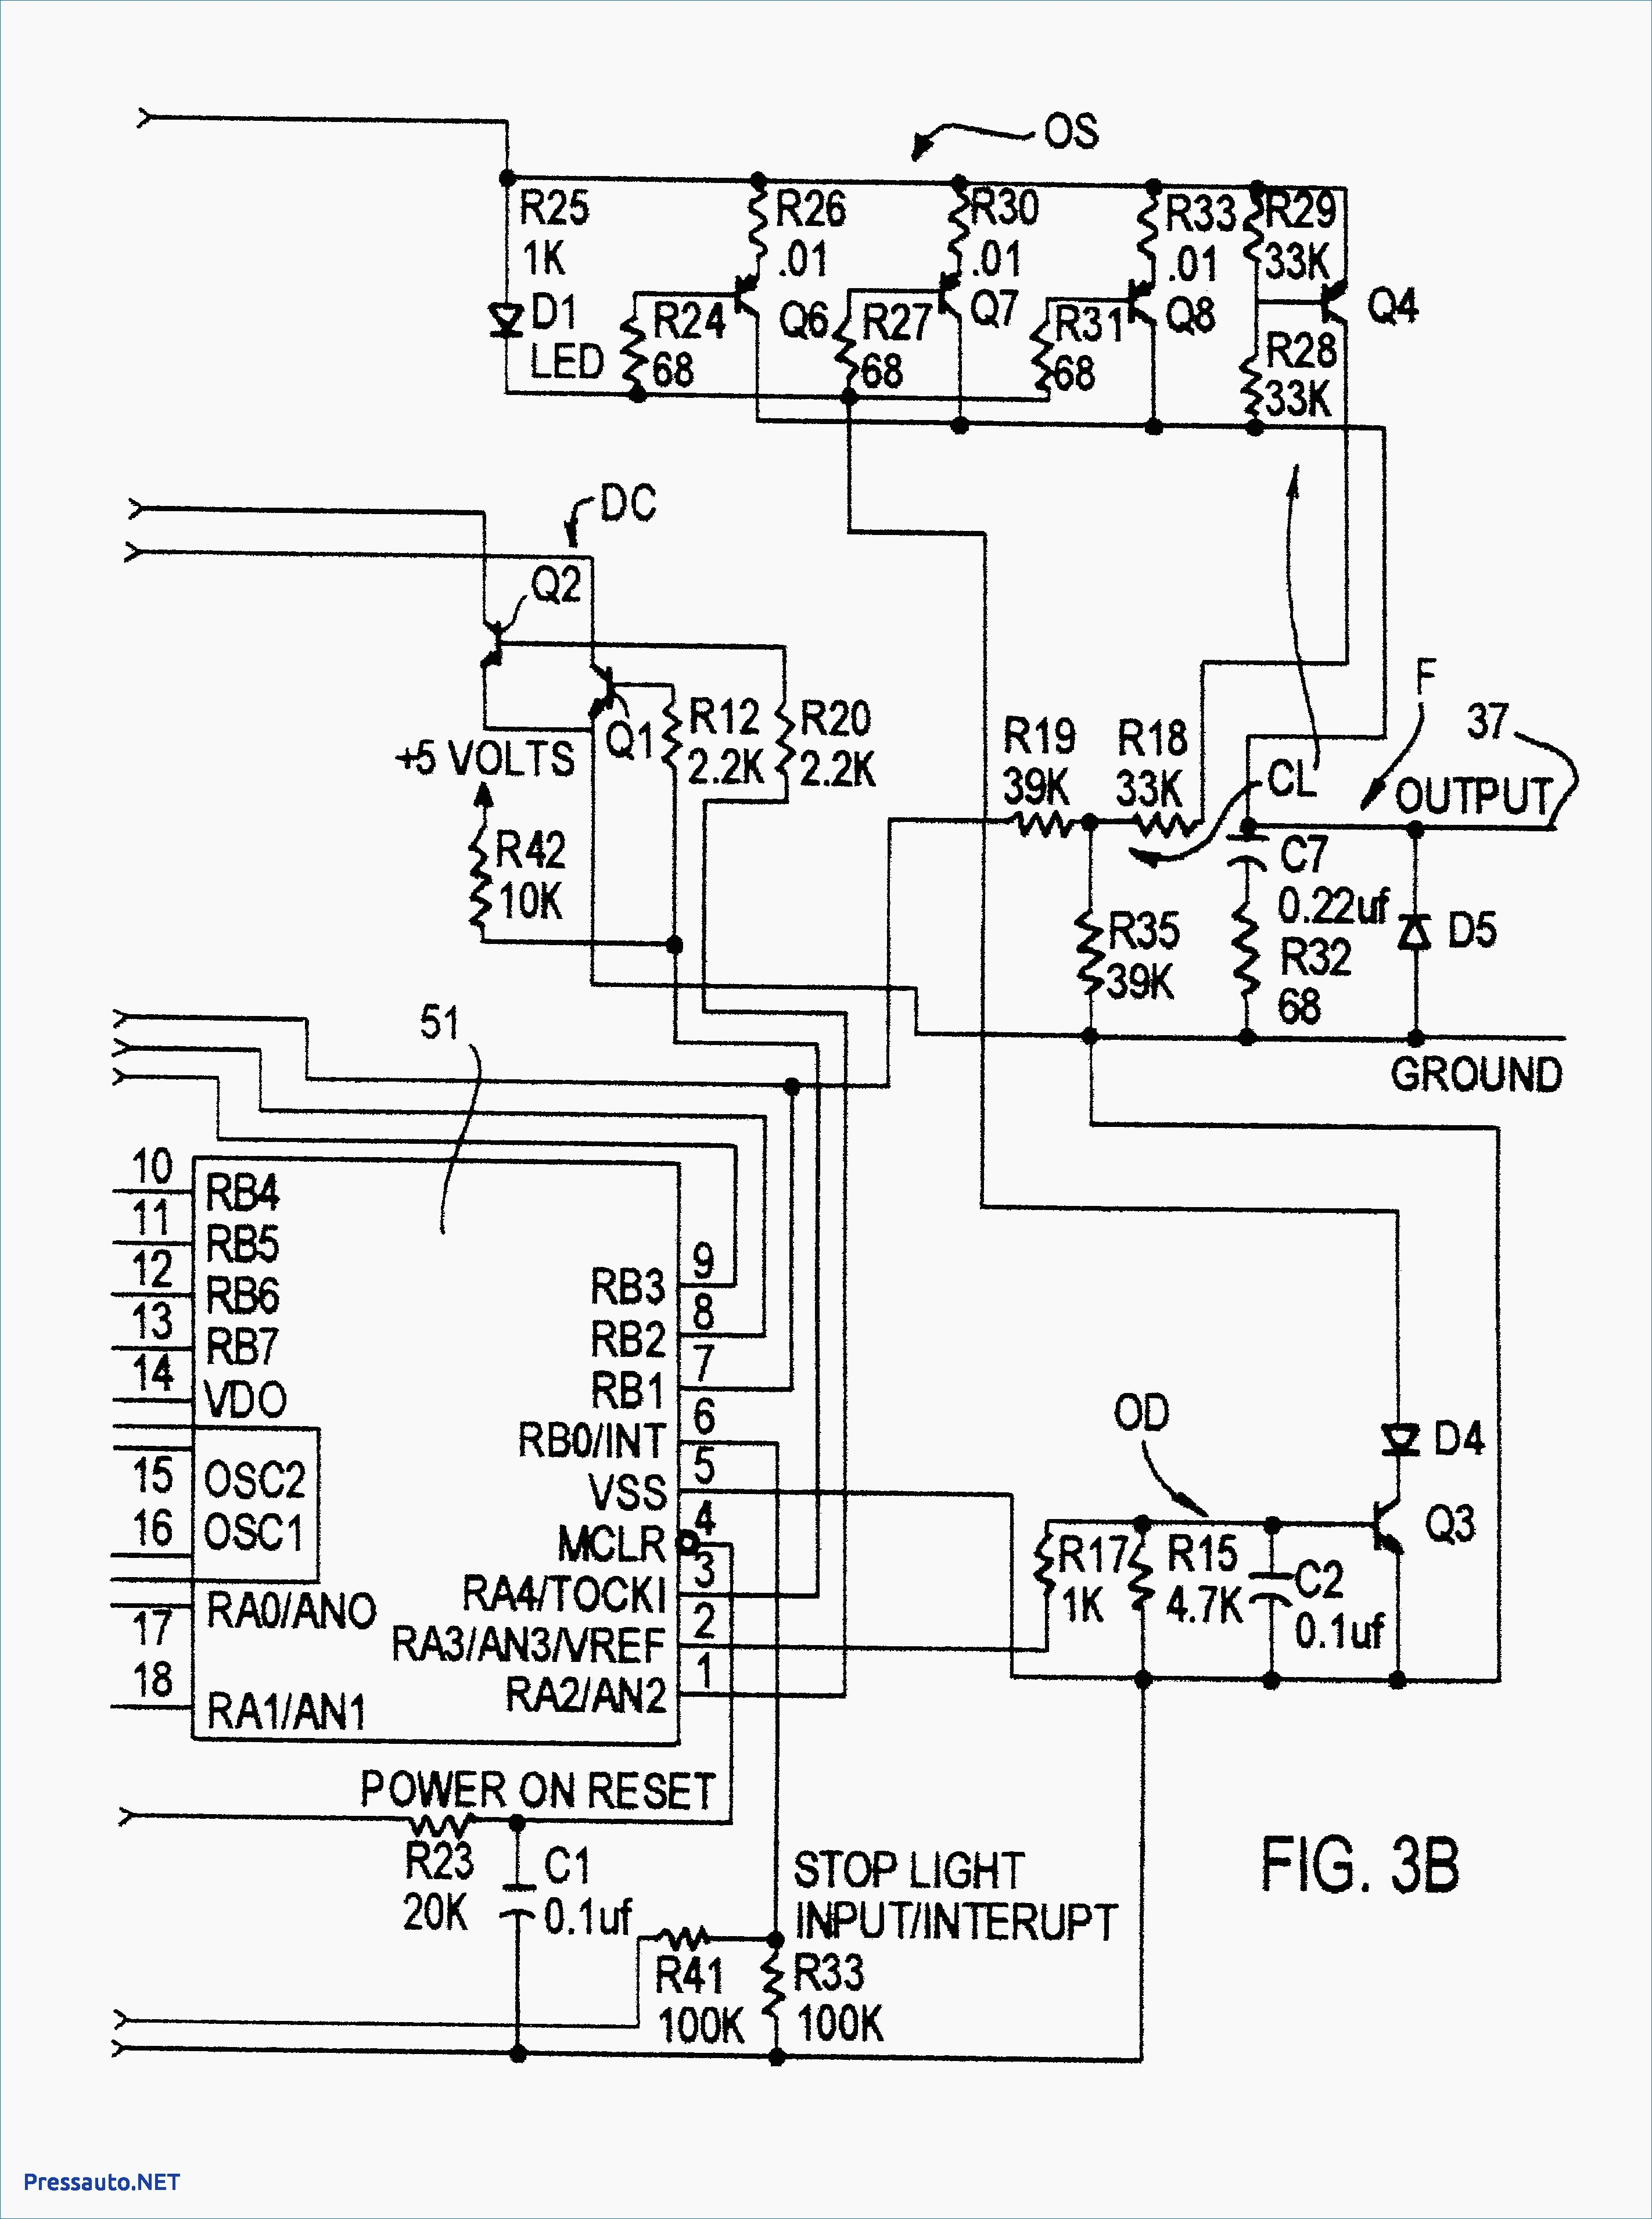 Massey Ferguson 35 Wiring Diagram Electric Trailer Brakes Wiring Diagram  Wiring Diagram Of Massey Ferguson 35